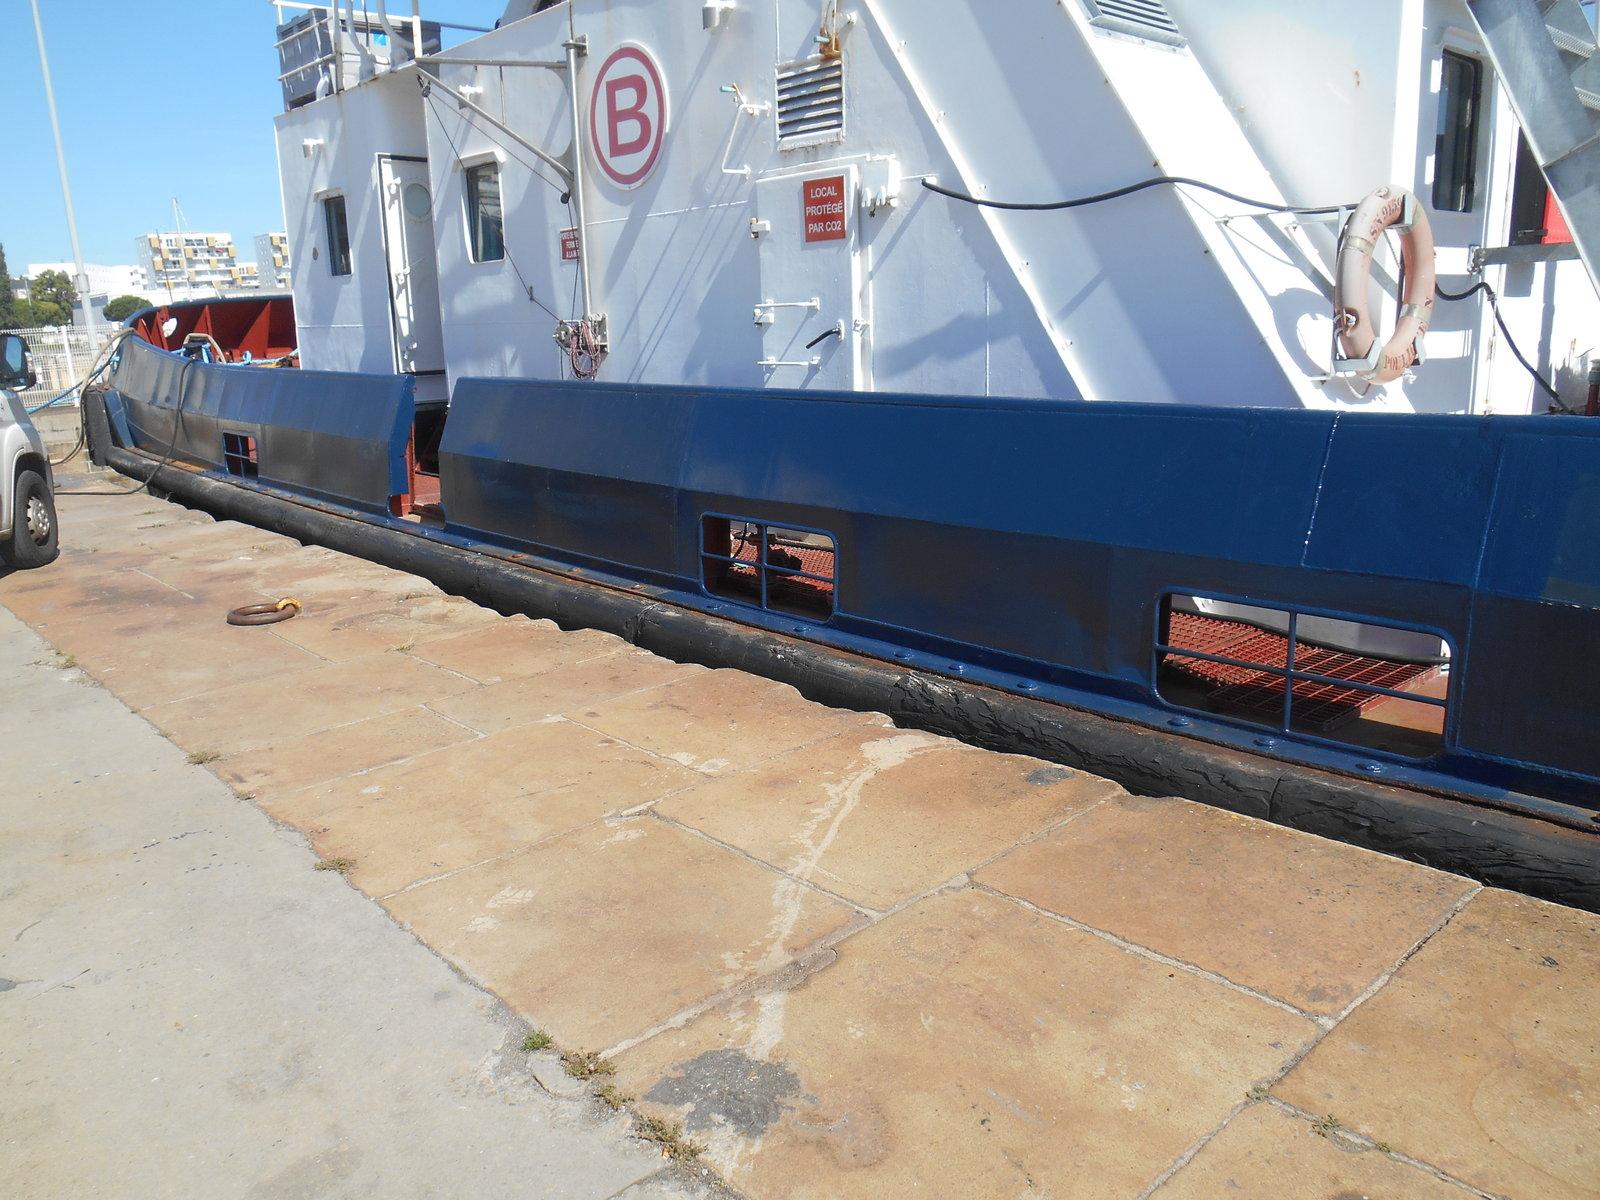 Tracteur azimutal VB Pouliguen de Namornik 200708010450142710